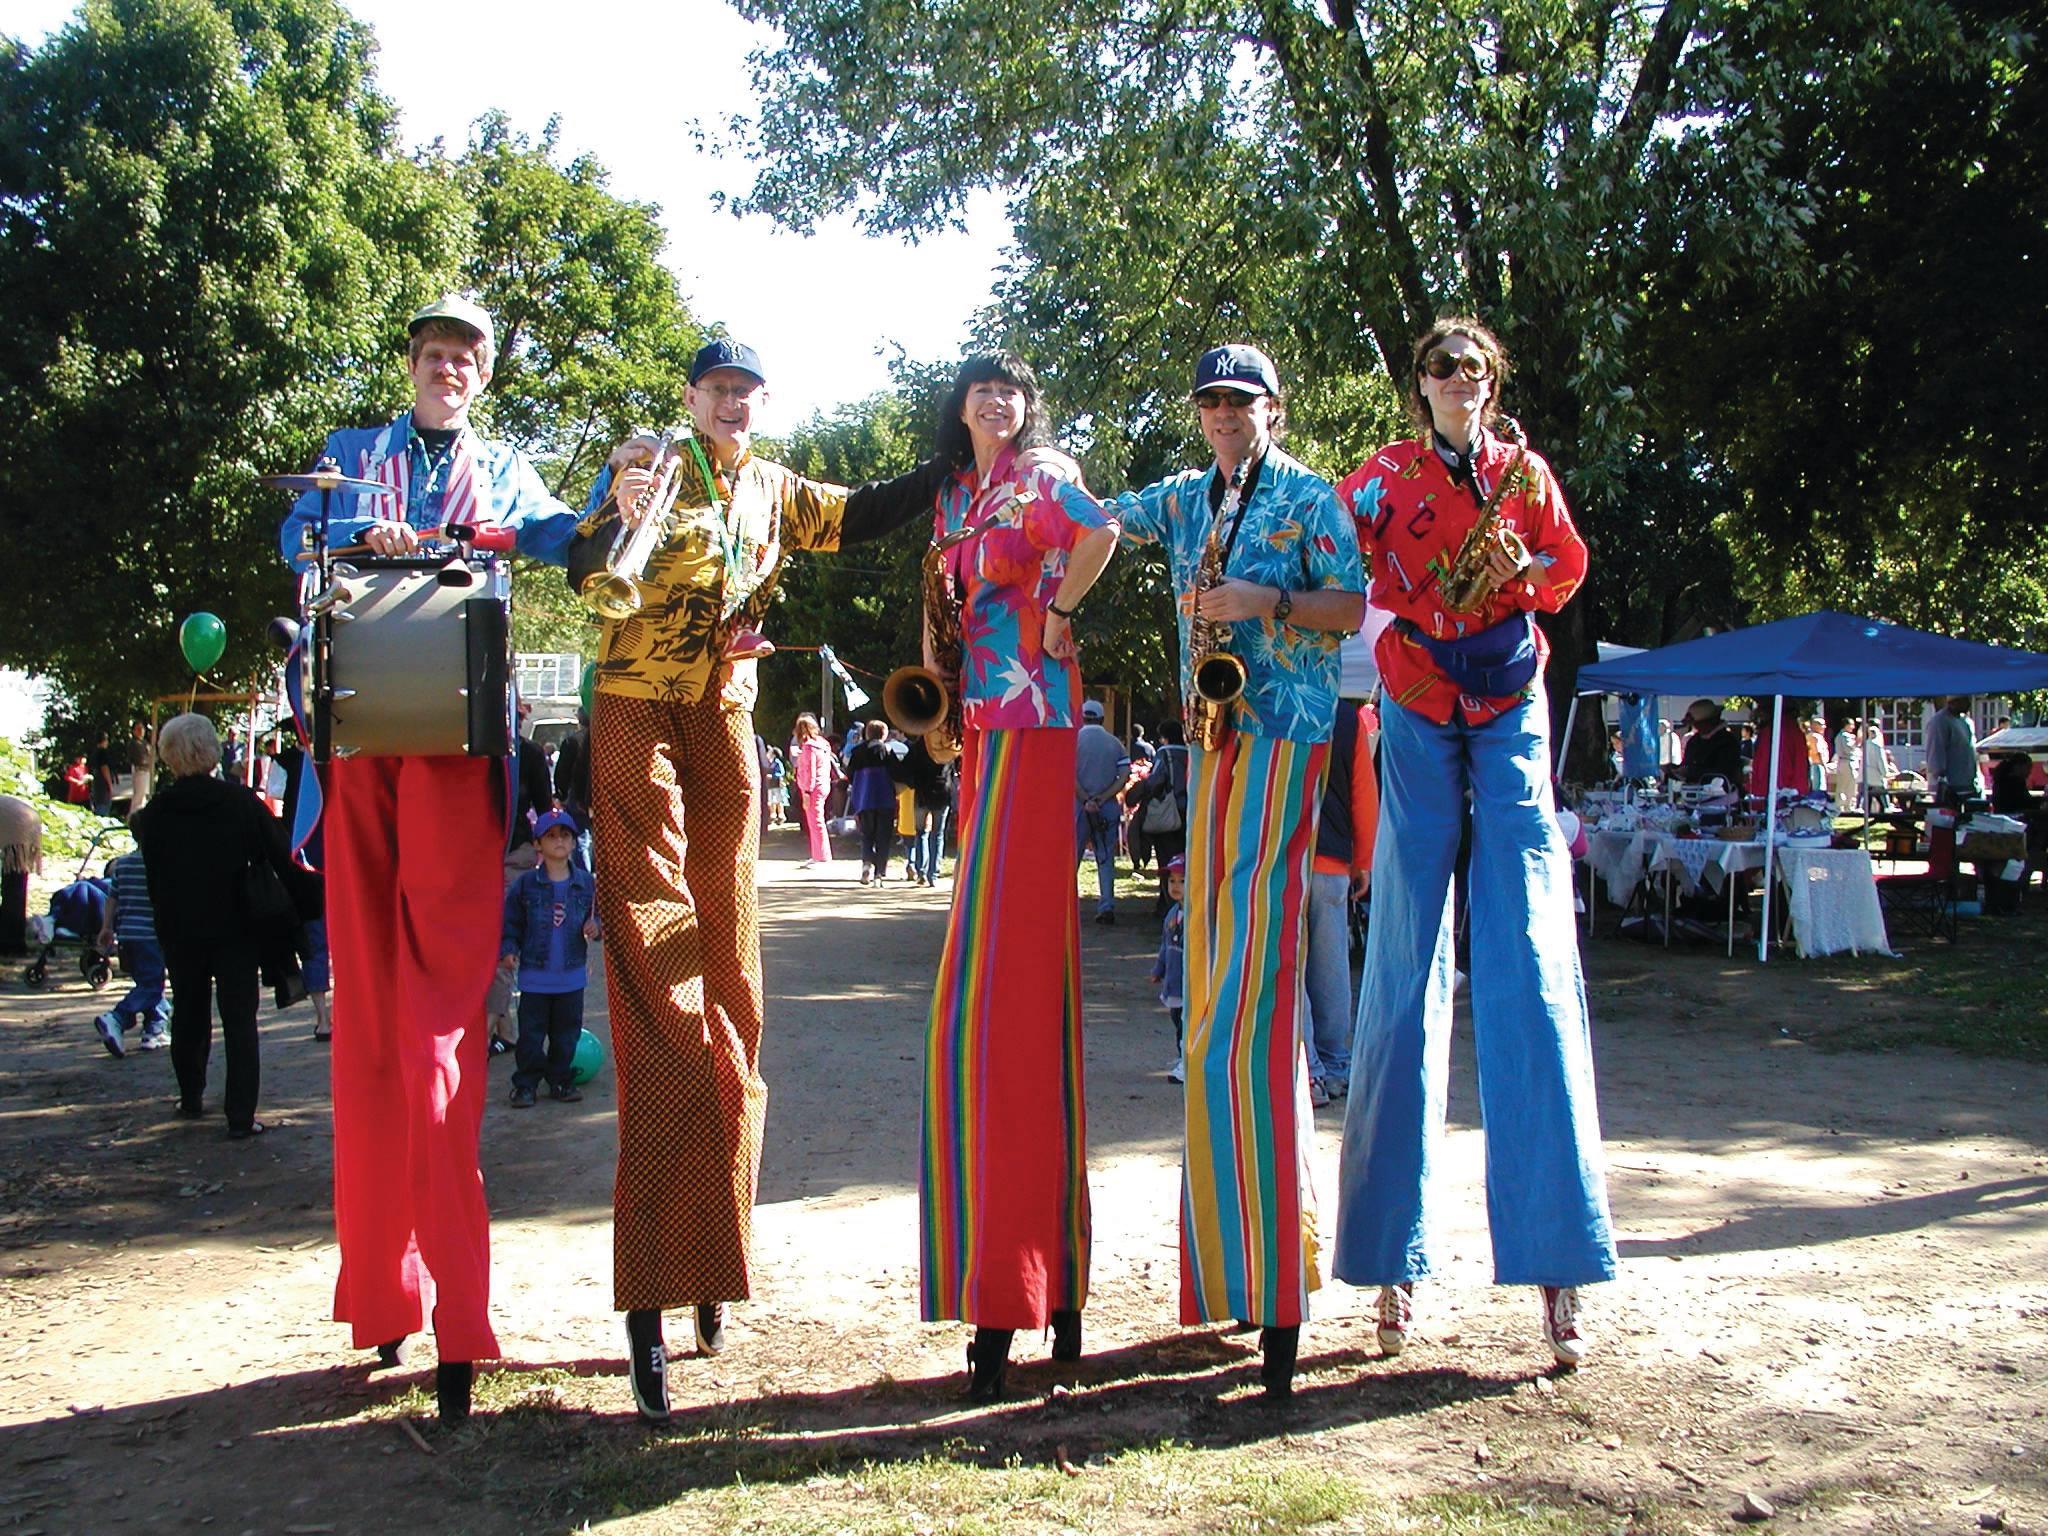 Queens County Farm fall festival